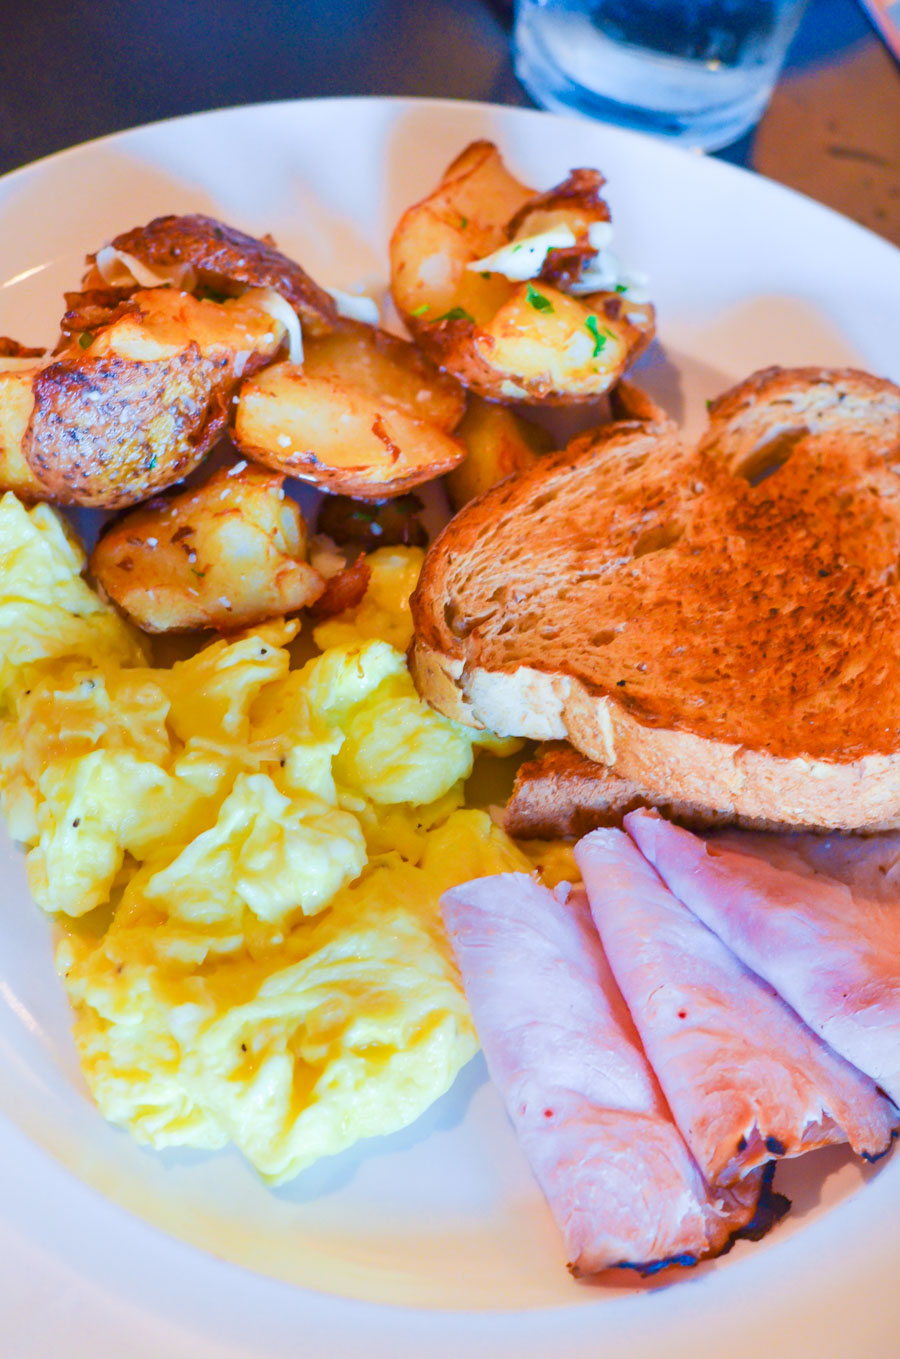 Where to Eat in St. Louis | Restaurant Guide | Triumph Grill at Hotel Ignacio